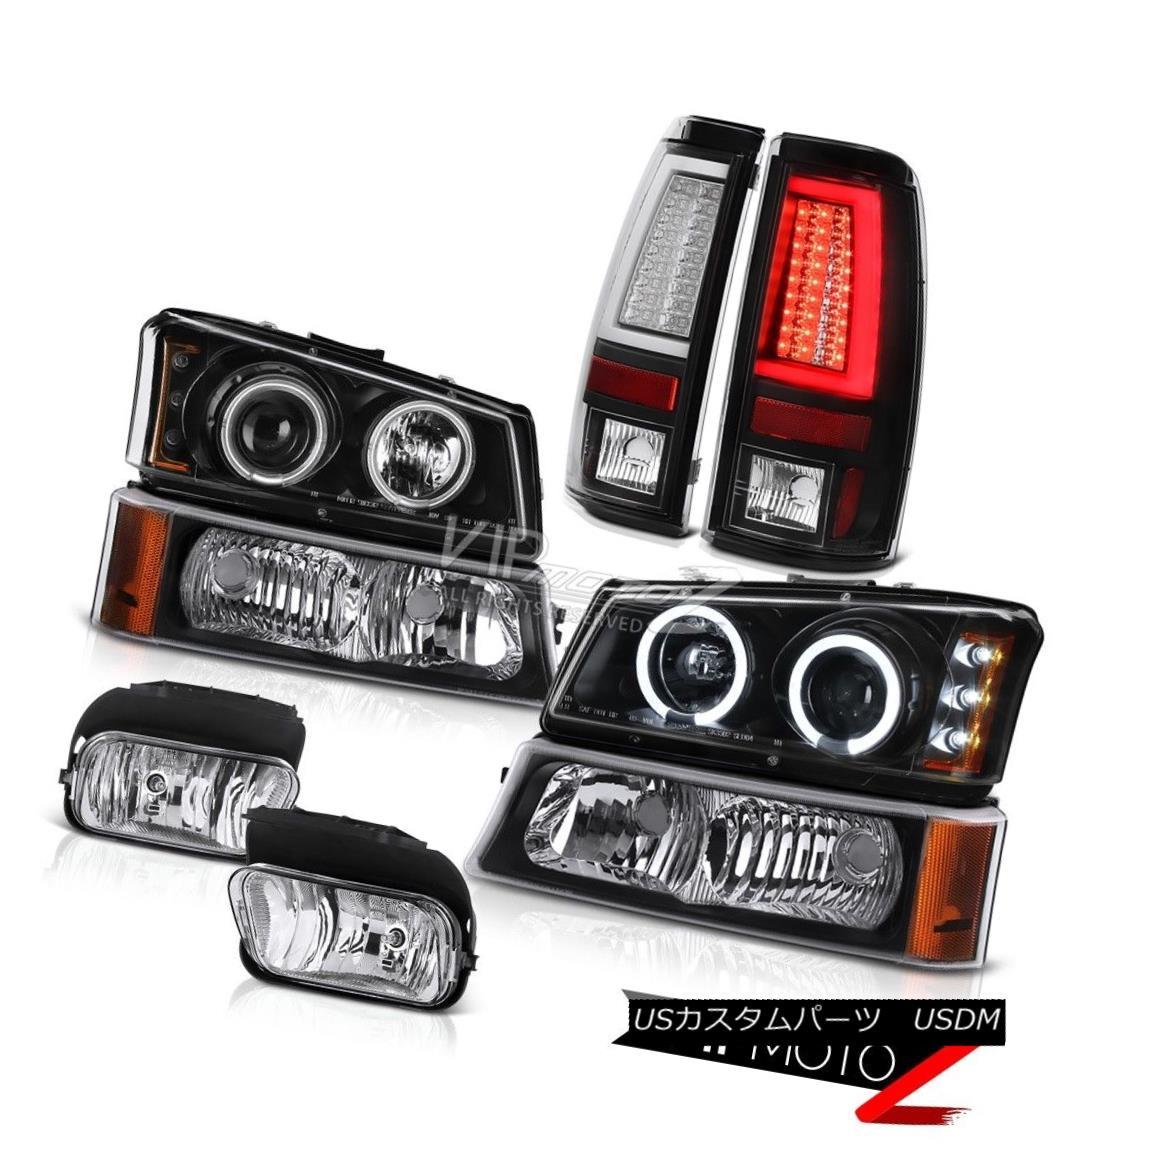 03-06 Silverado Chrome Headlights+Bumper Lamps+LED Tail Lamps+3rd Brake Light